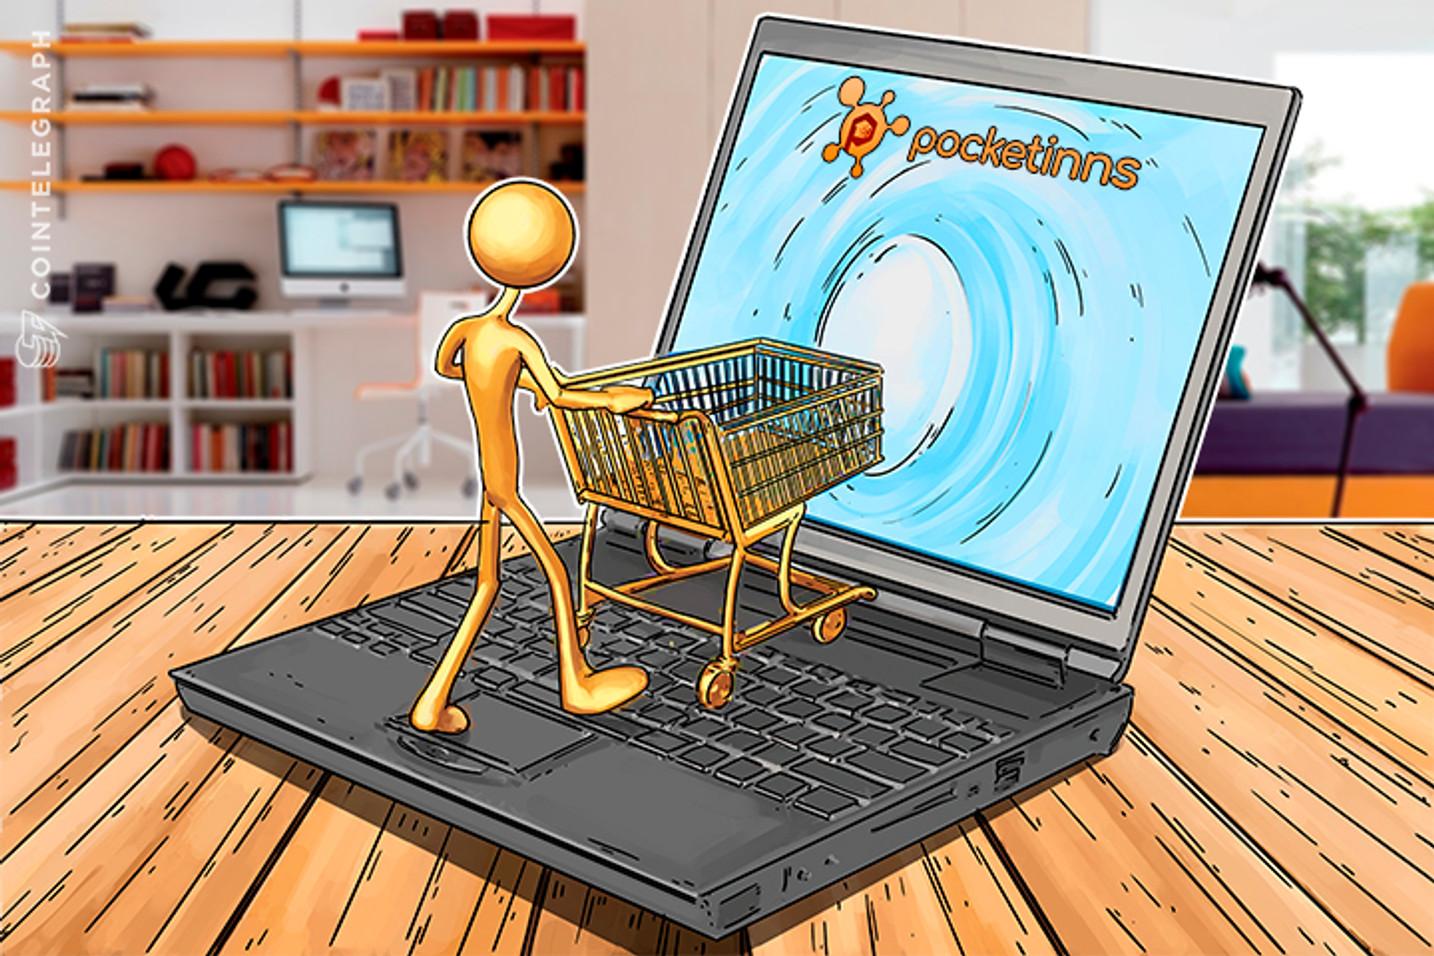 Blockchain Company Wants to Create Alternative Decentralized Digital Economy